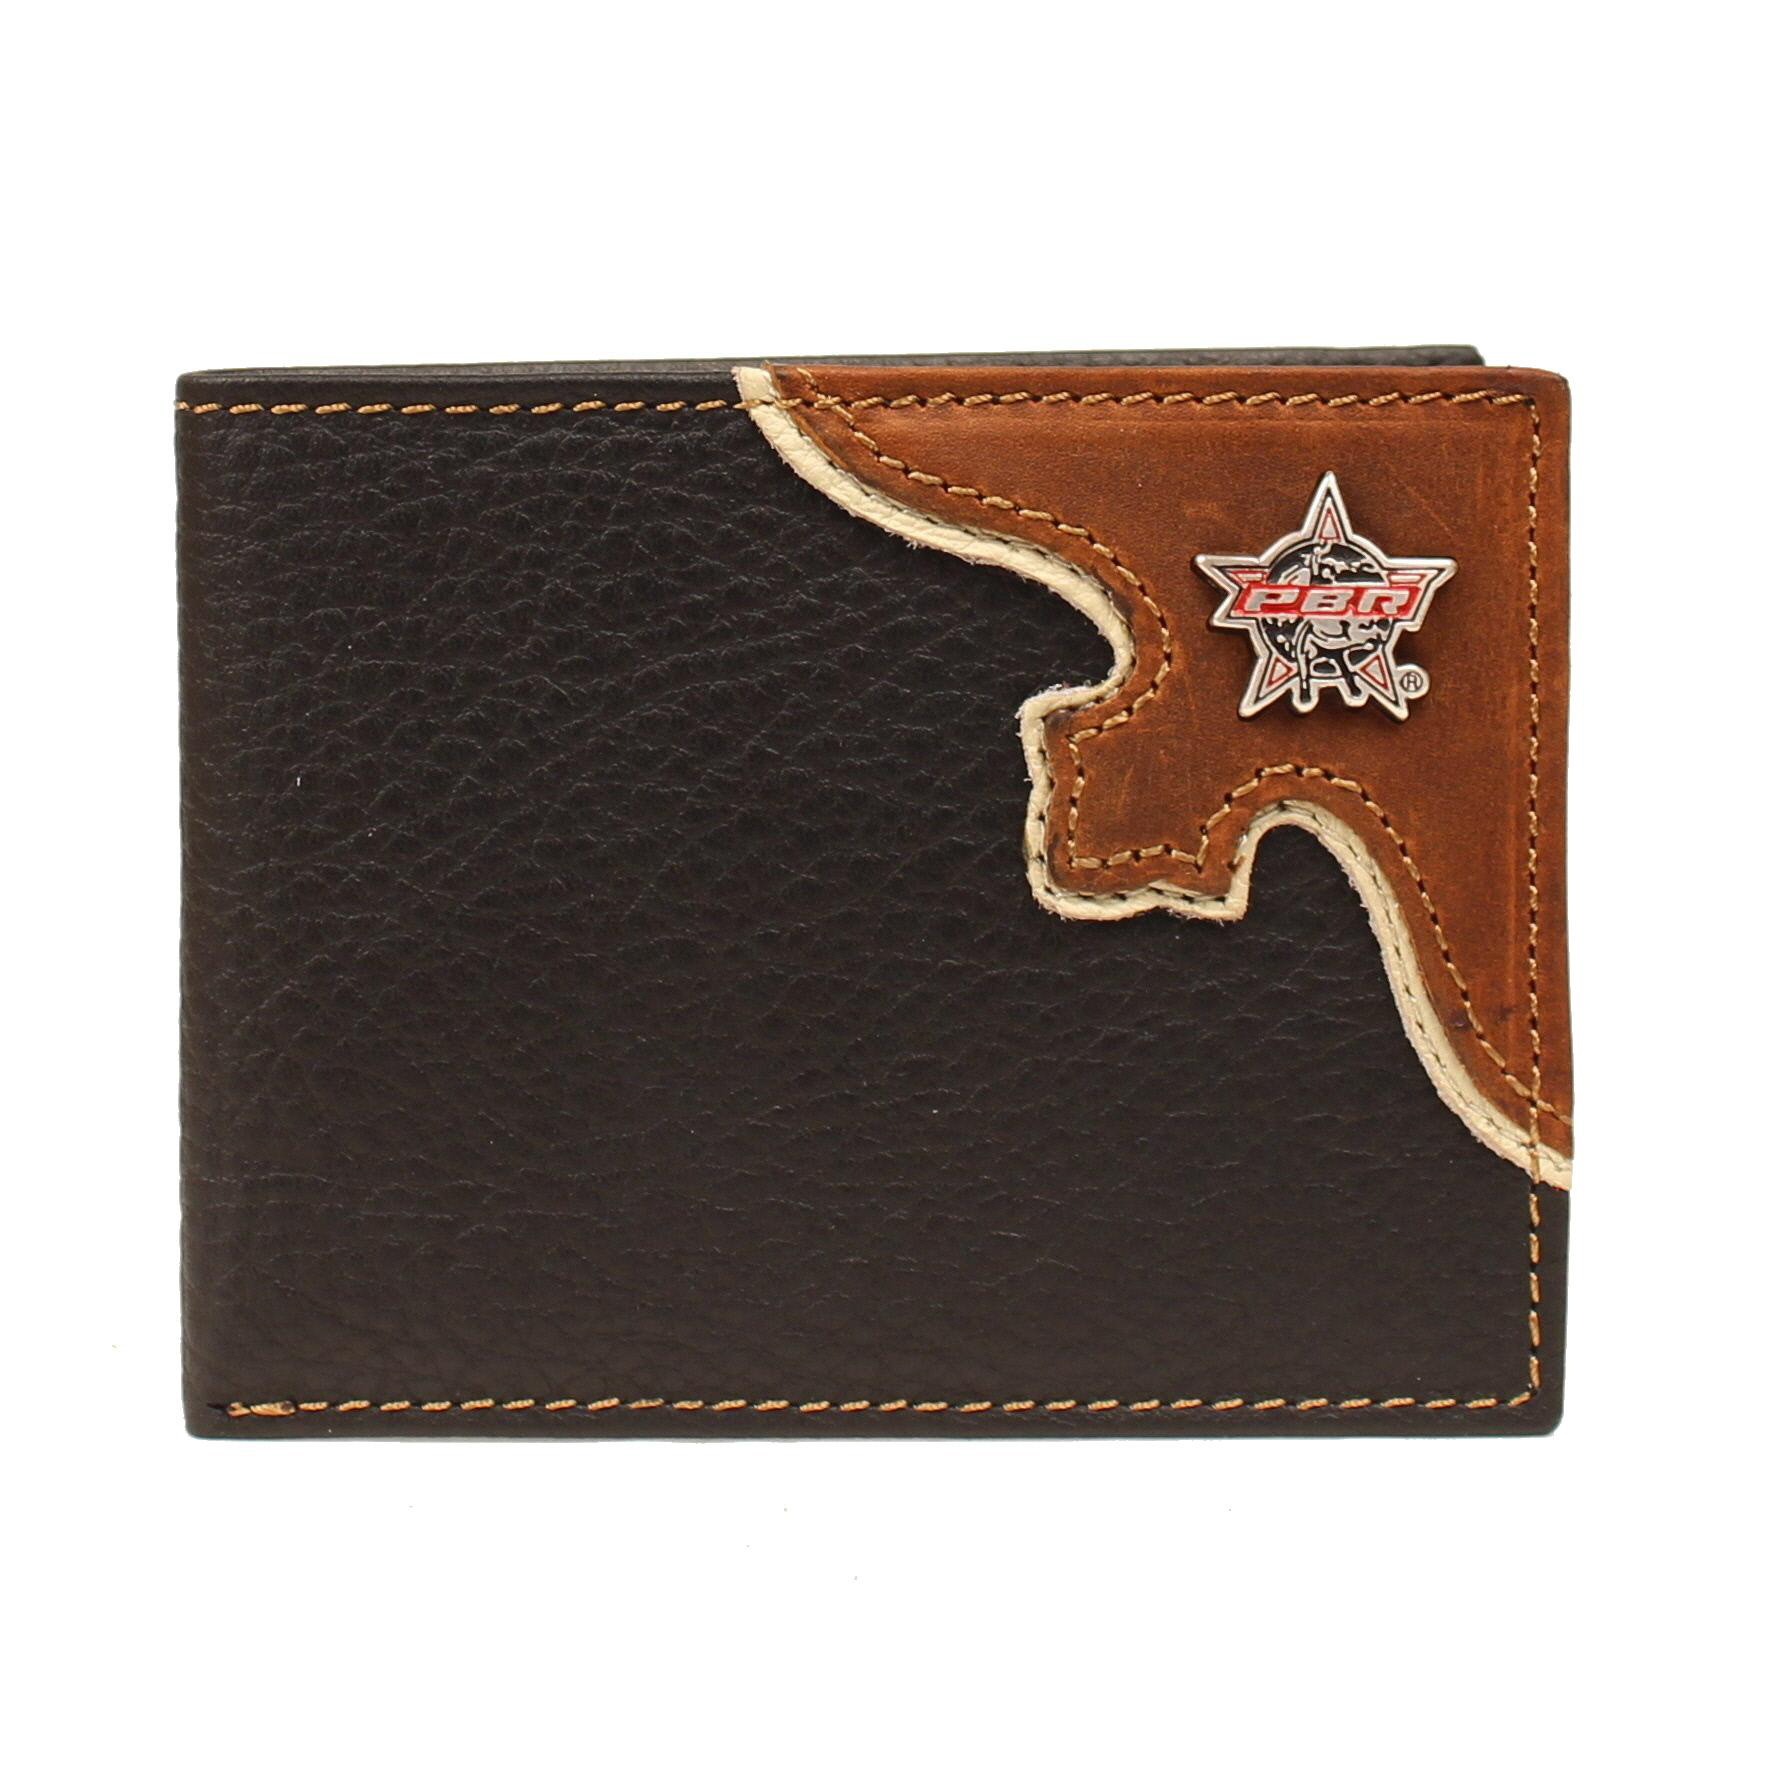 PBR Bi-fold Overlay Wallet